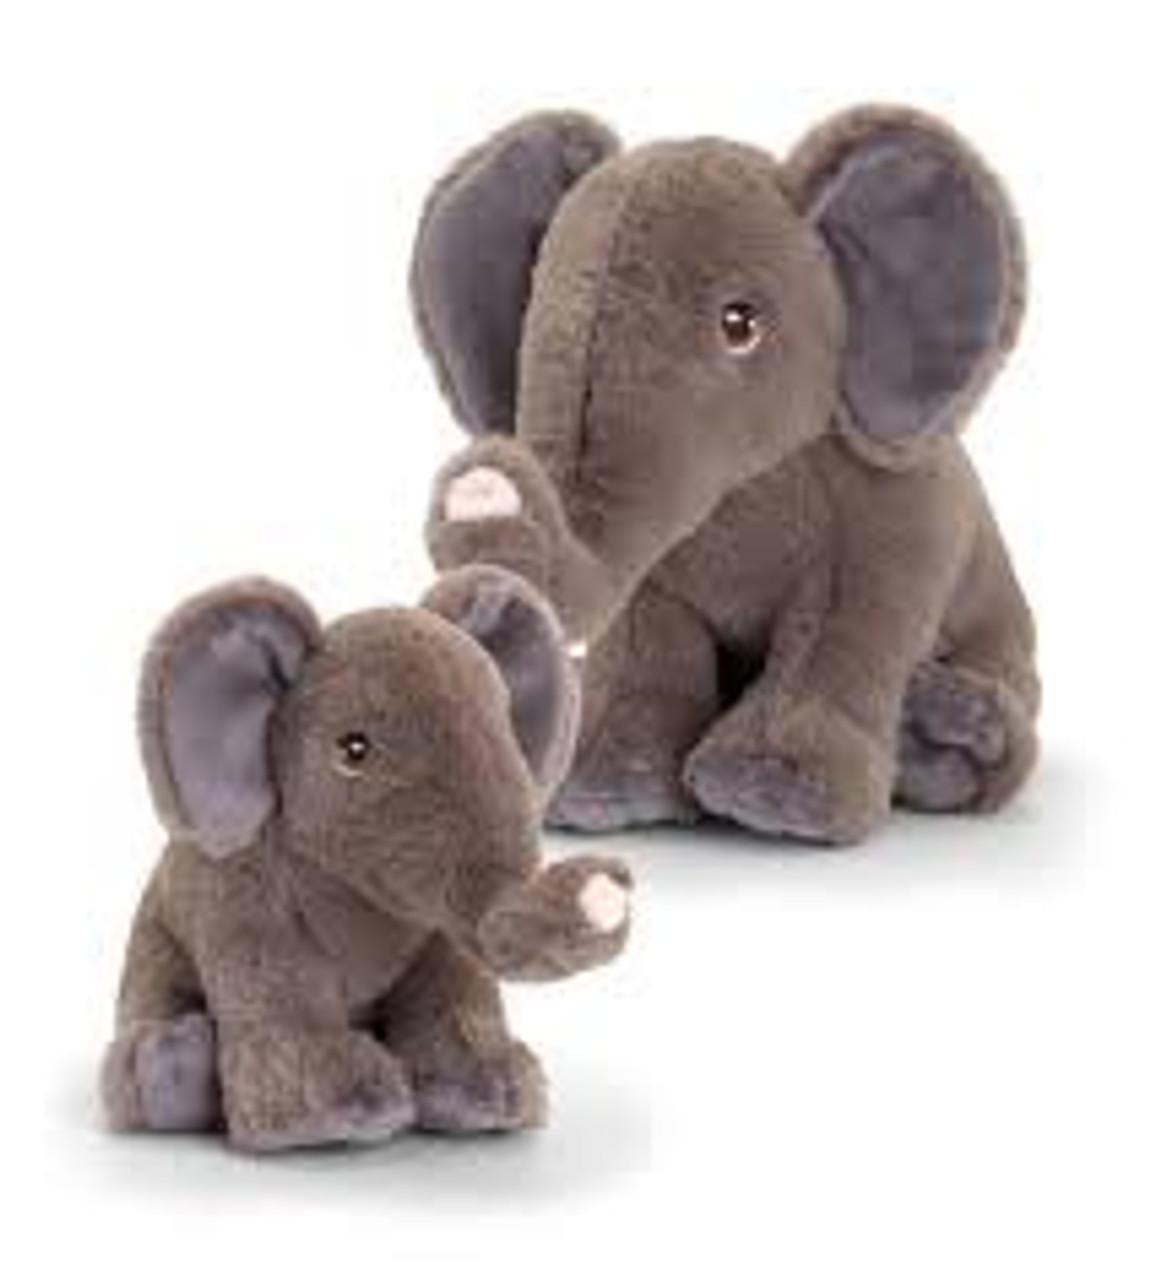 Korimco Elephant Keeleco Plush at Baby Barn Discounts Elephant from Korimco Keeleco are our favourite realistically cute plush!